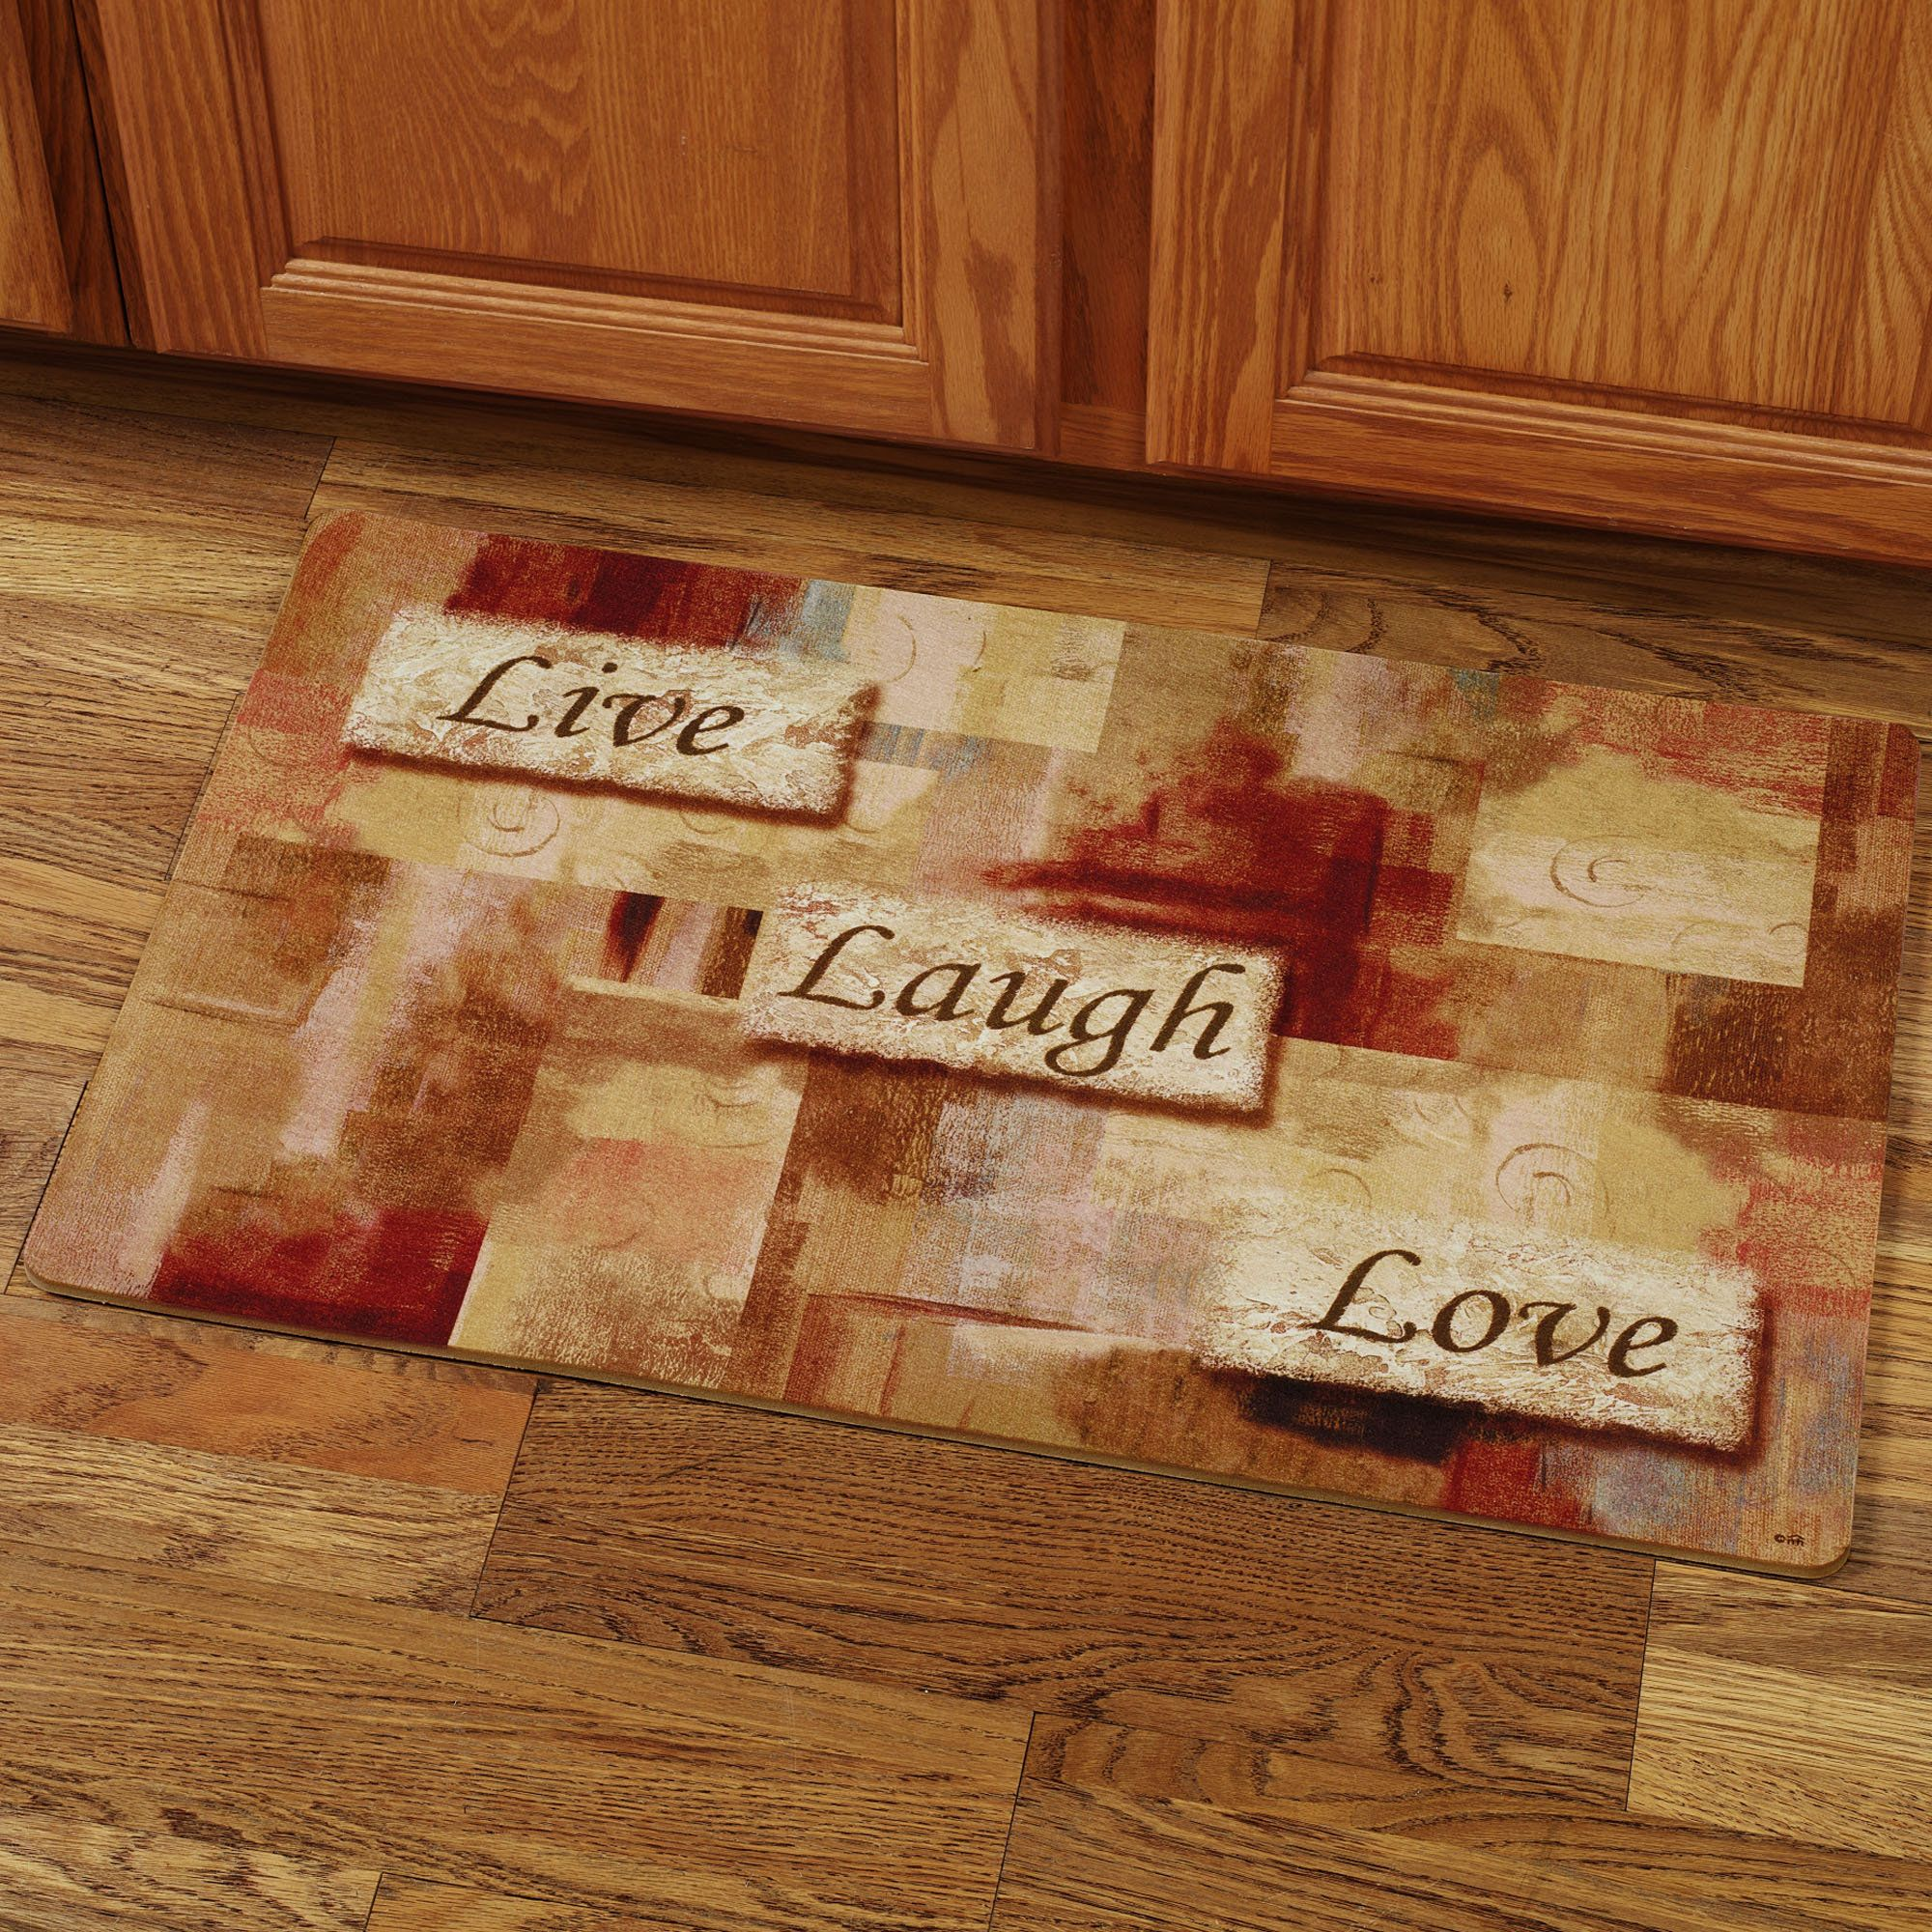 Live laugh love foam kitchen comfort mat kitchen rugs